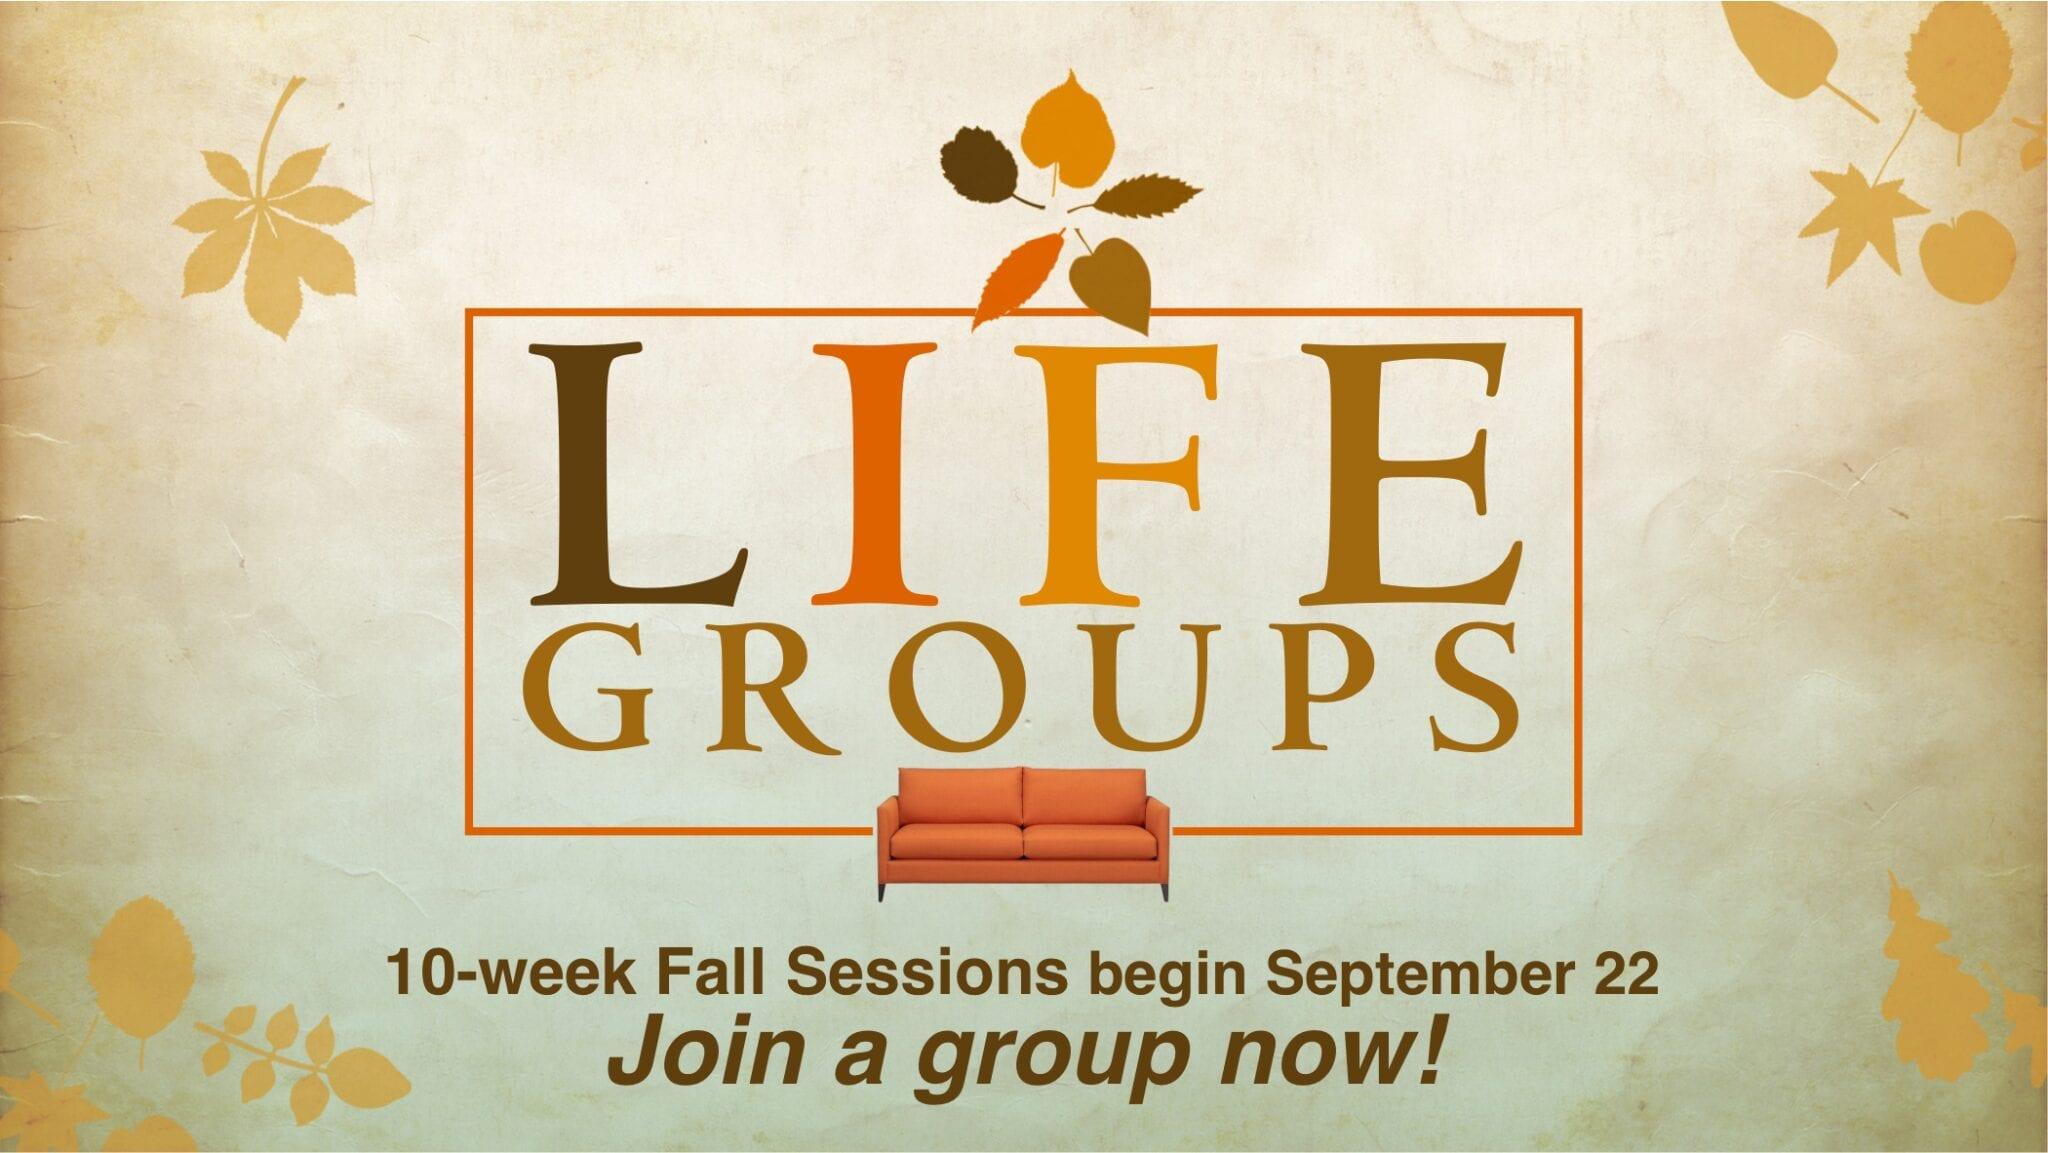 LifeGroups 10-week Fall Session